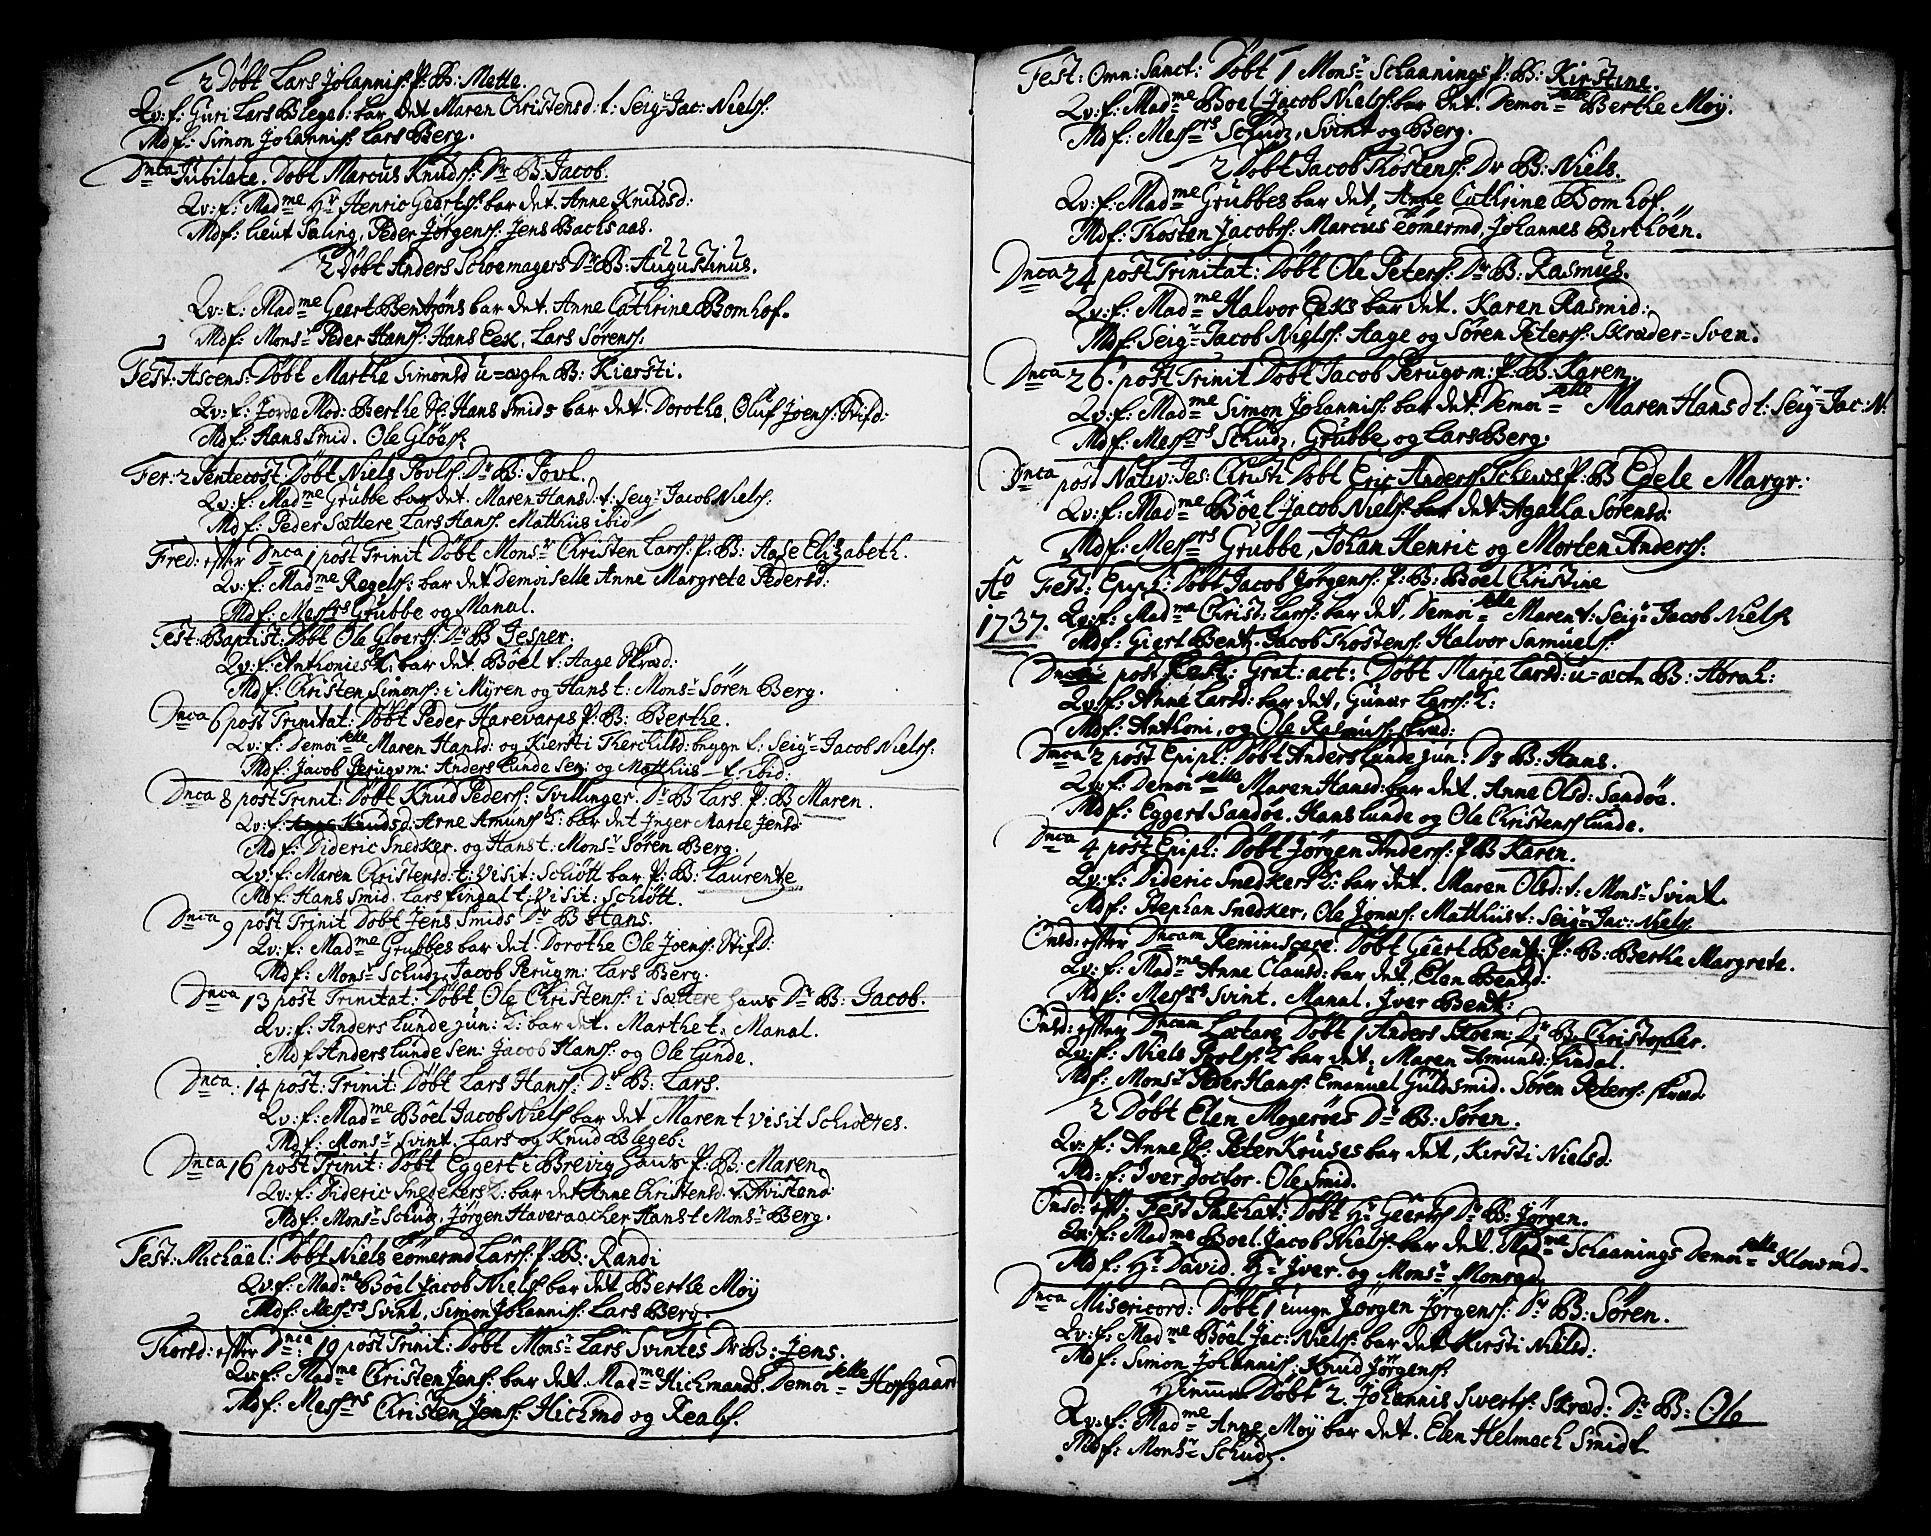 SAKO, Brevik kirkebøker, F/Fa/L0002: Ministerialbok nr. 2, 1720-1764, s. 34g